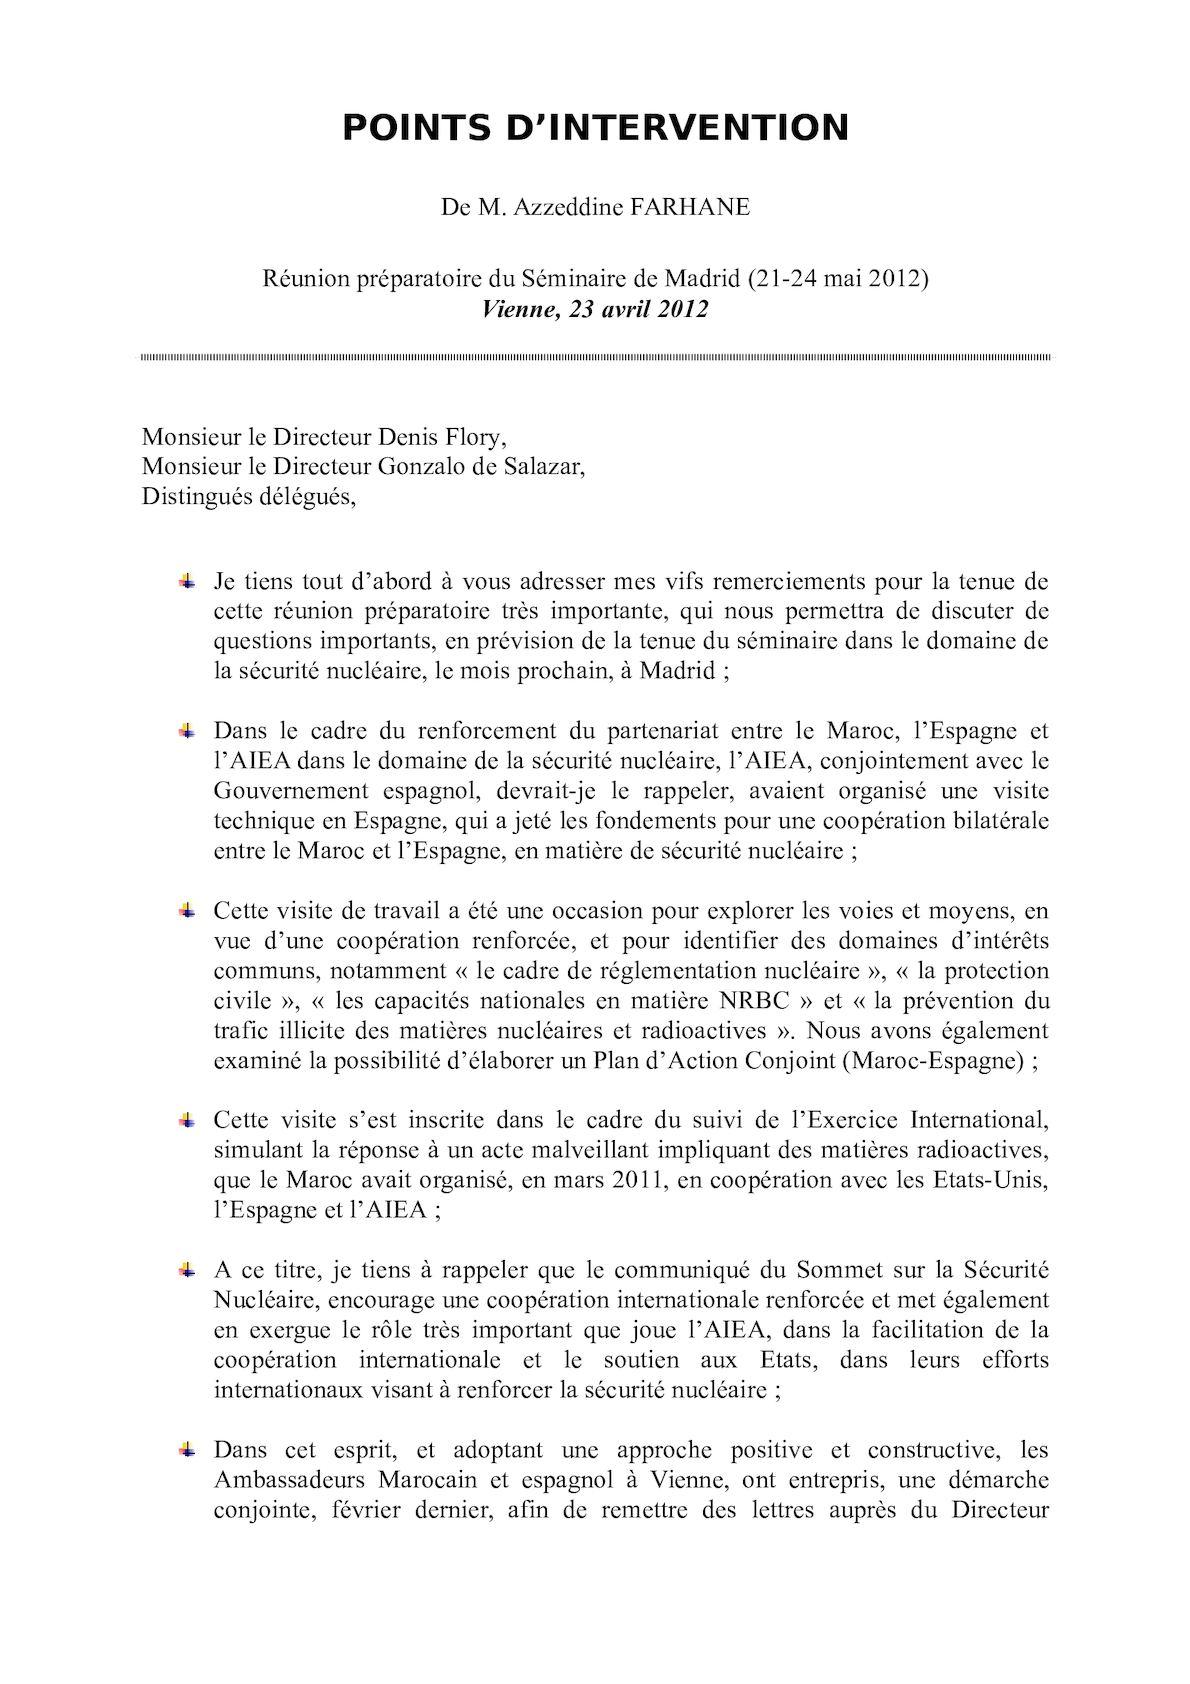 TALKING POINTS - Traduction Non Officielle